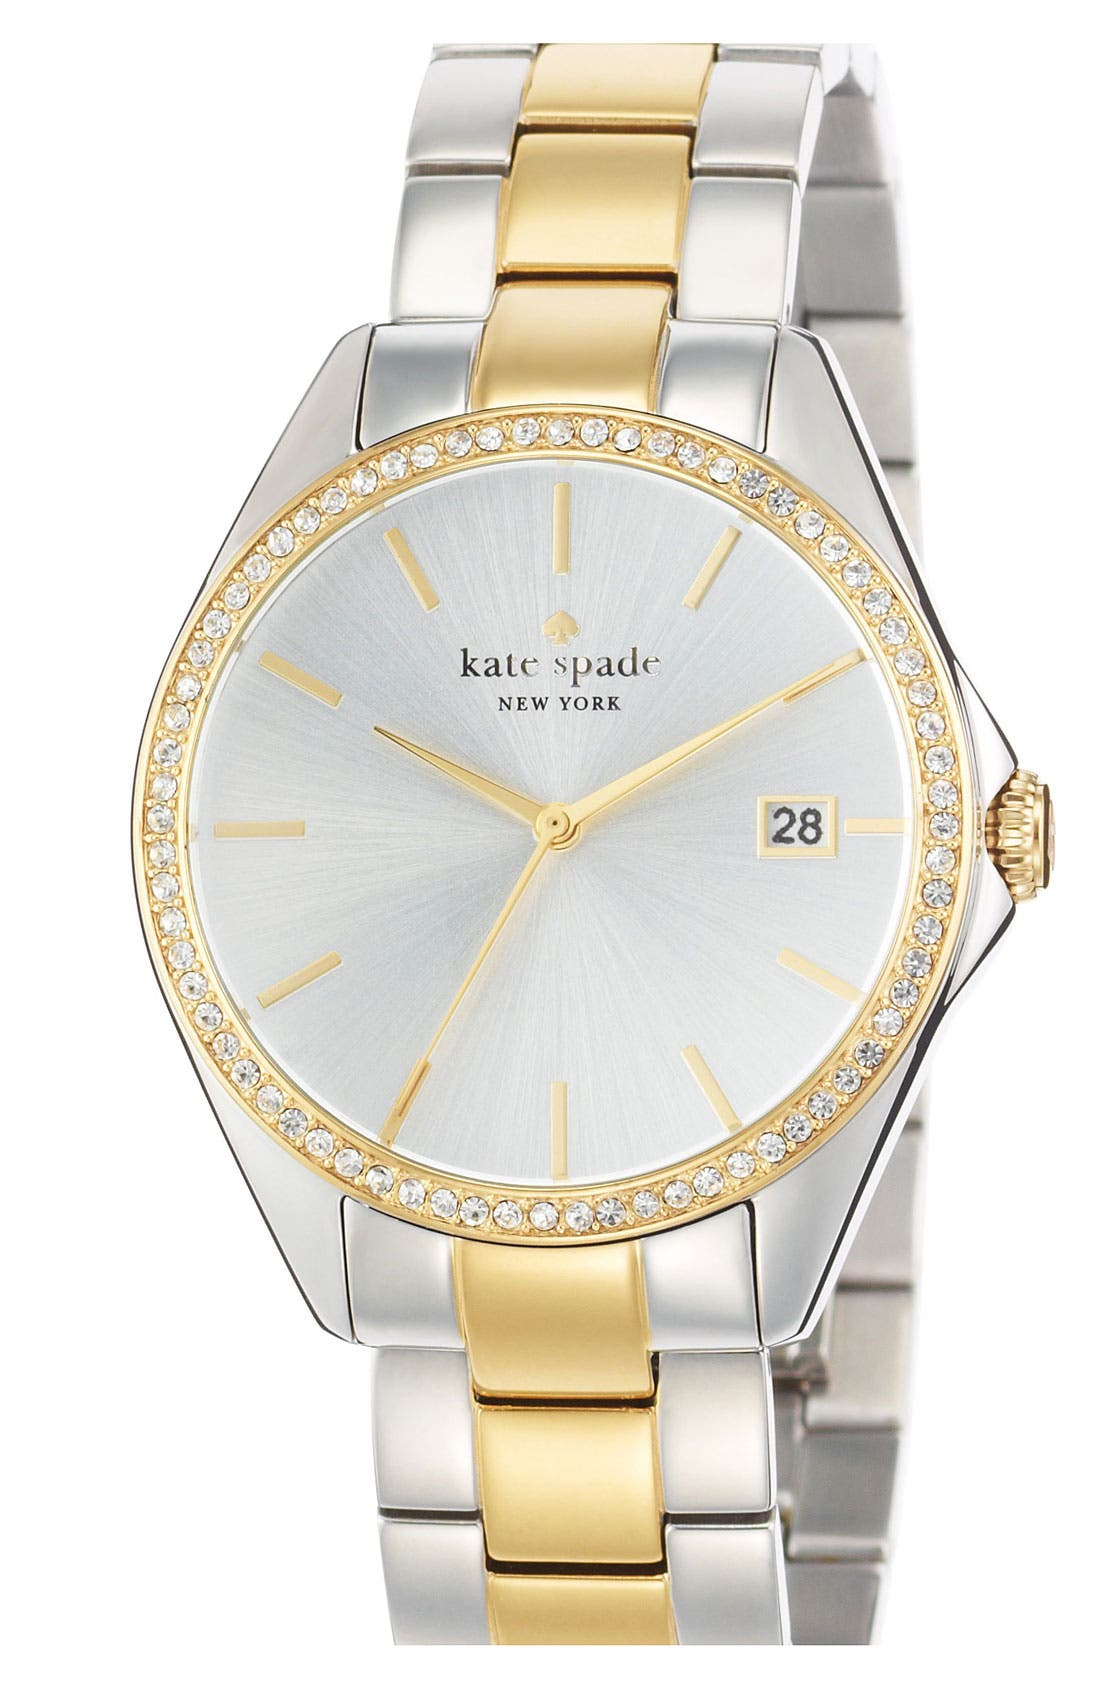 Main Image - kate spade new york 'seaport grand' crystal bracelet watch, 38mm